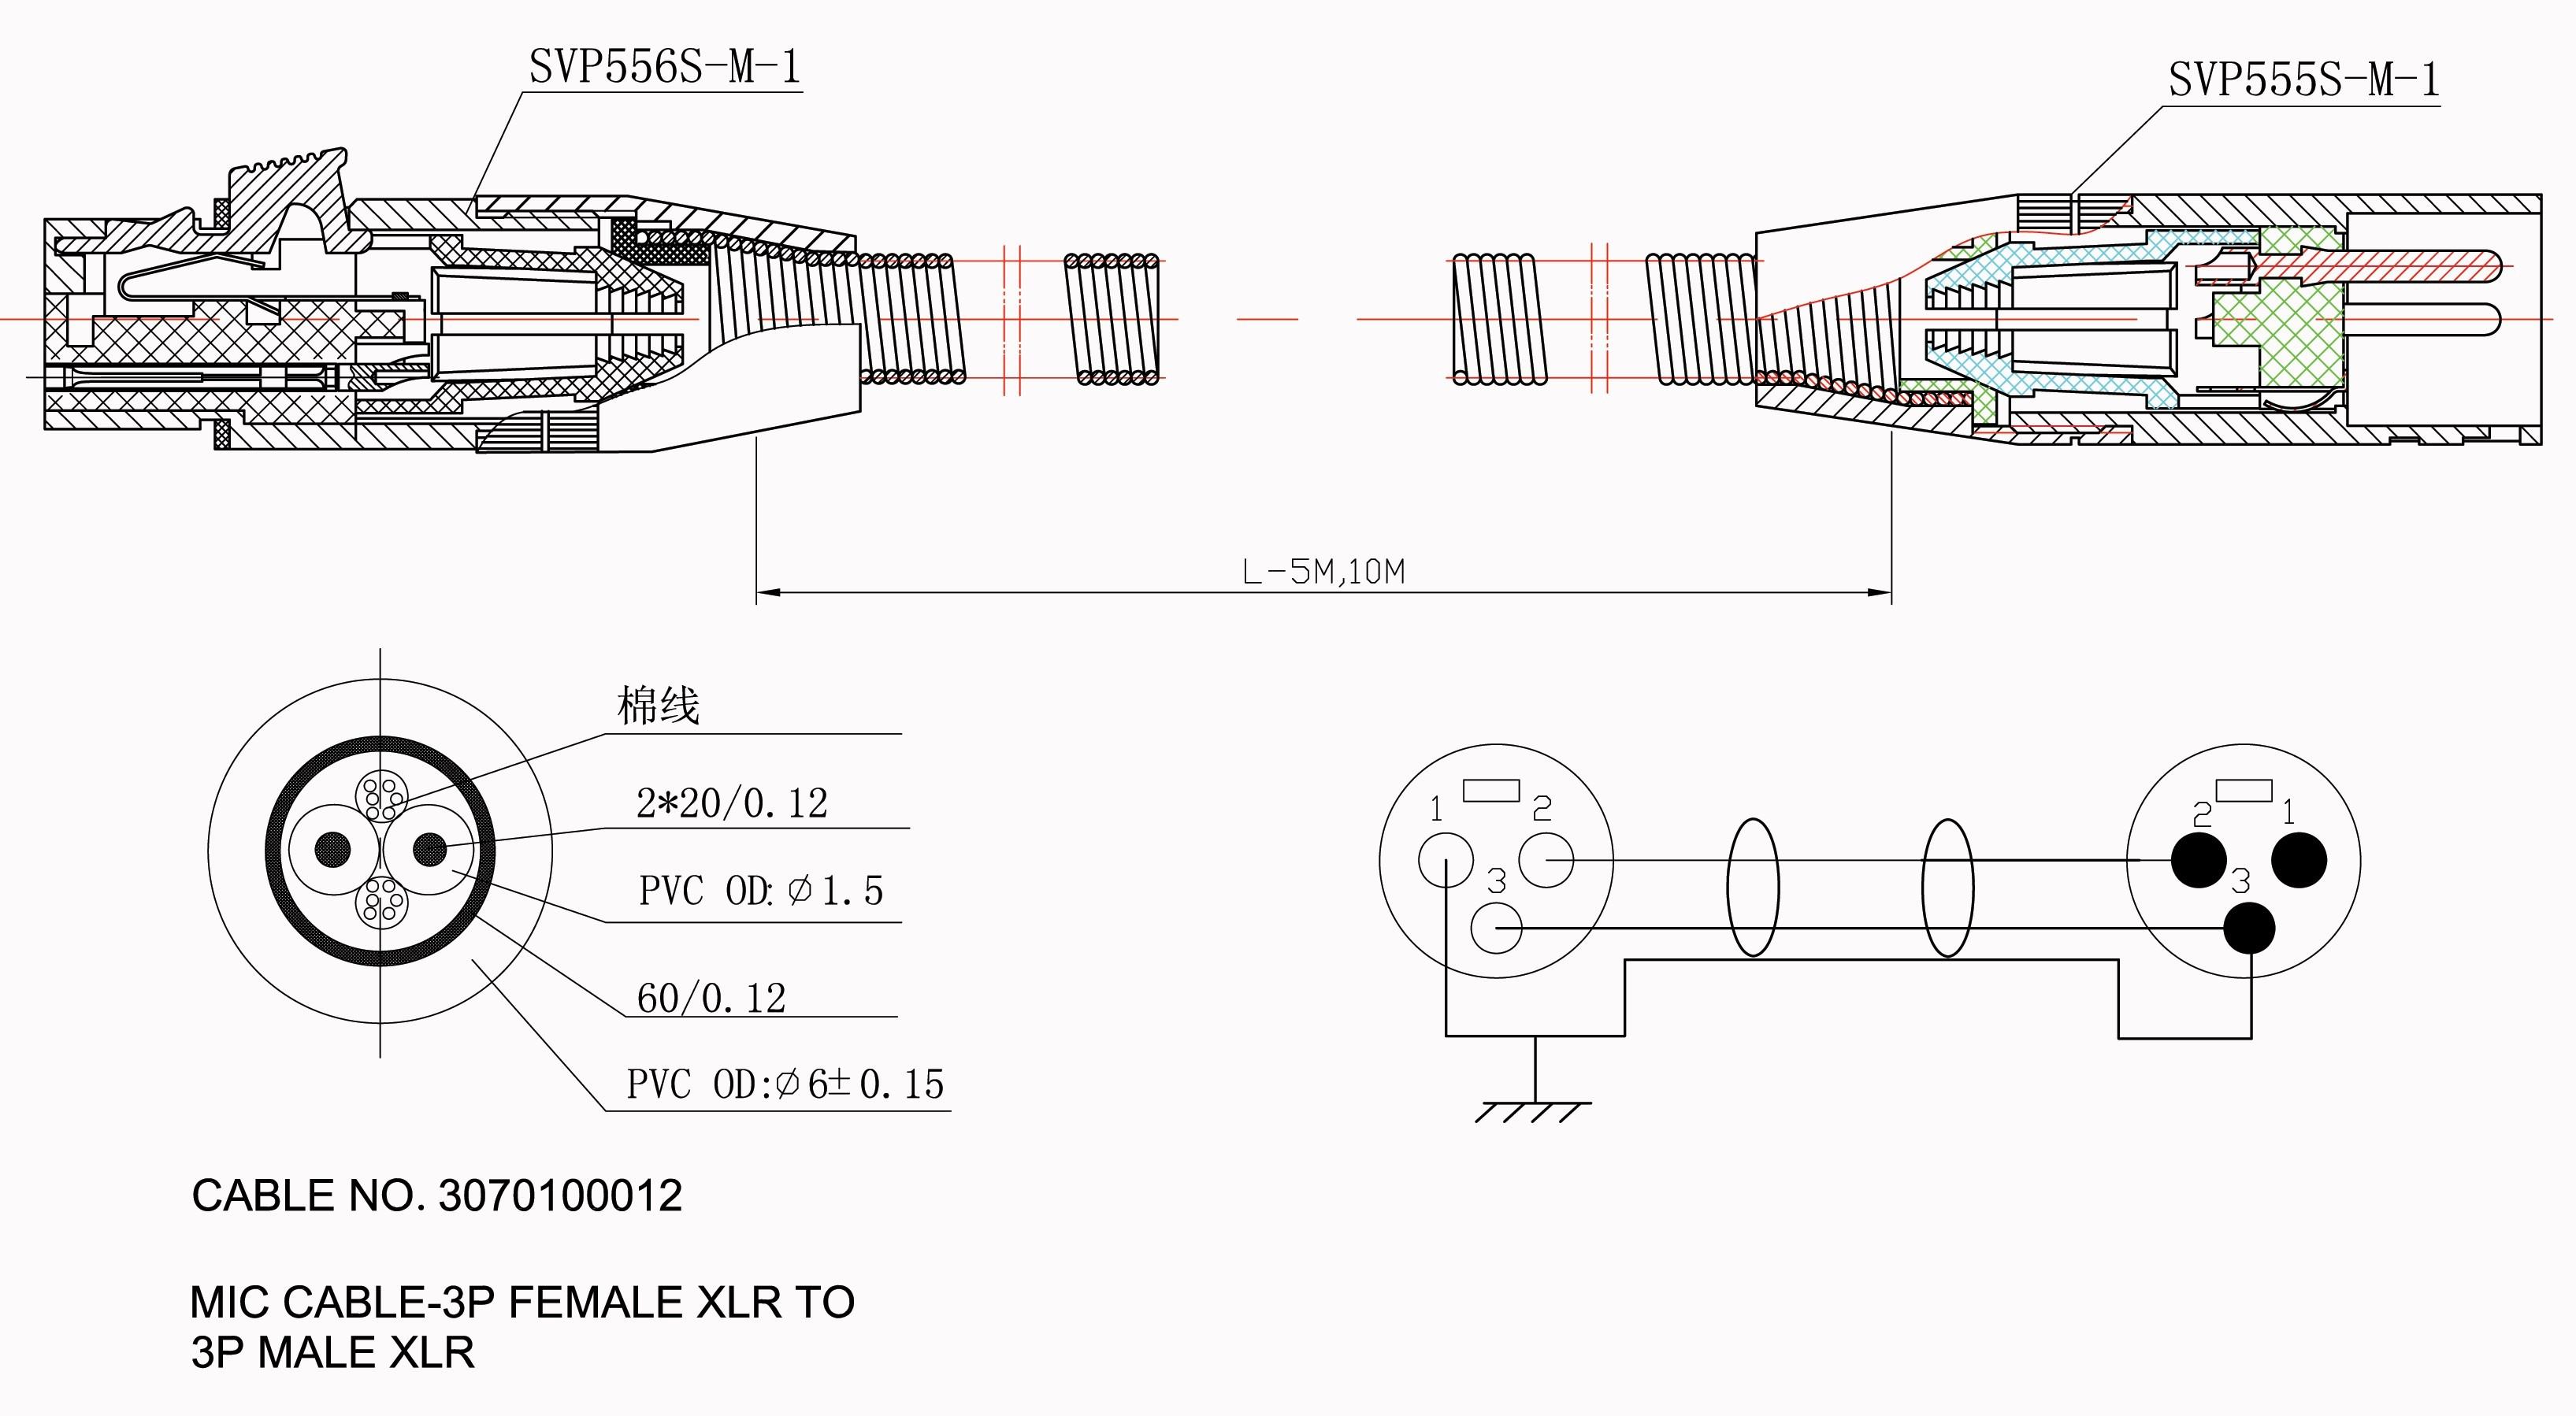 california trailer wiring diagram 2001 dodge ram trailer wiring diagram sprecher schuh ca3 9 10 wiring diagram | free wiring diagram